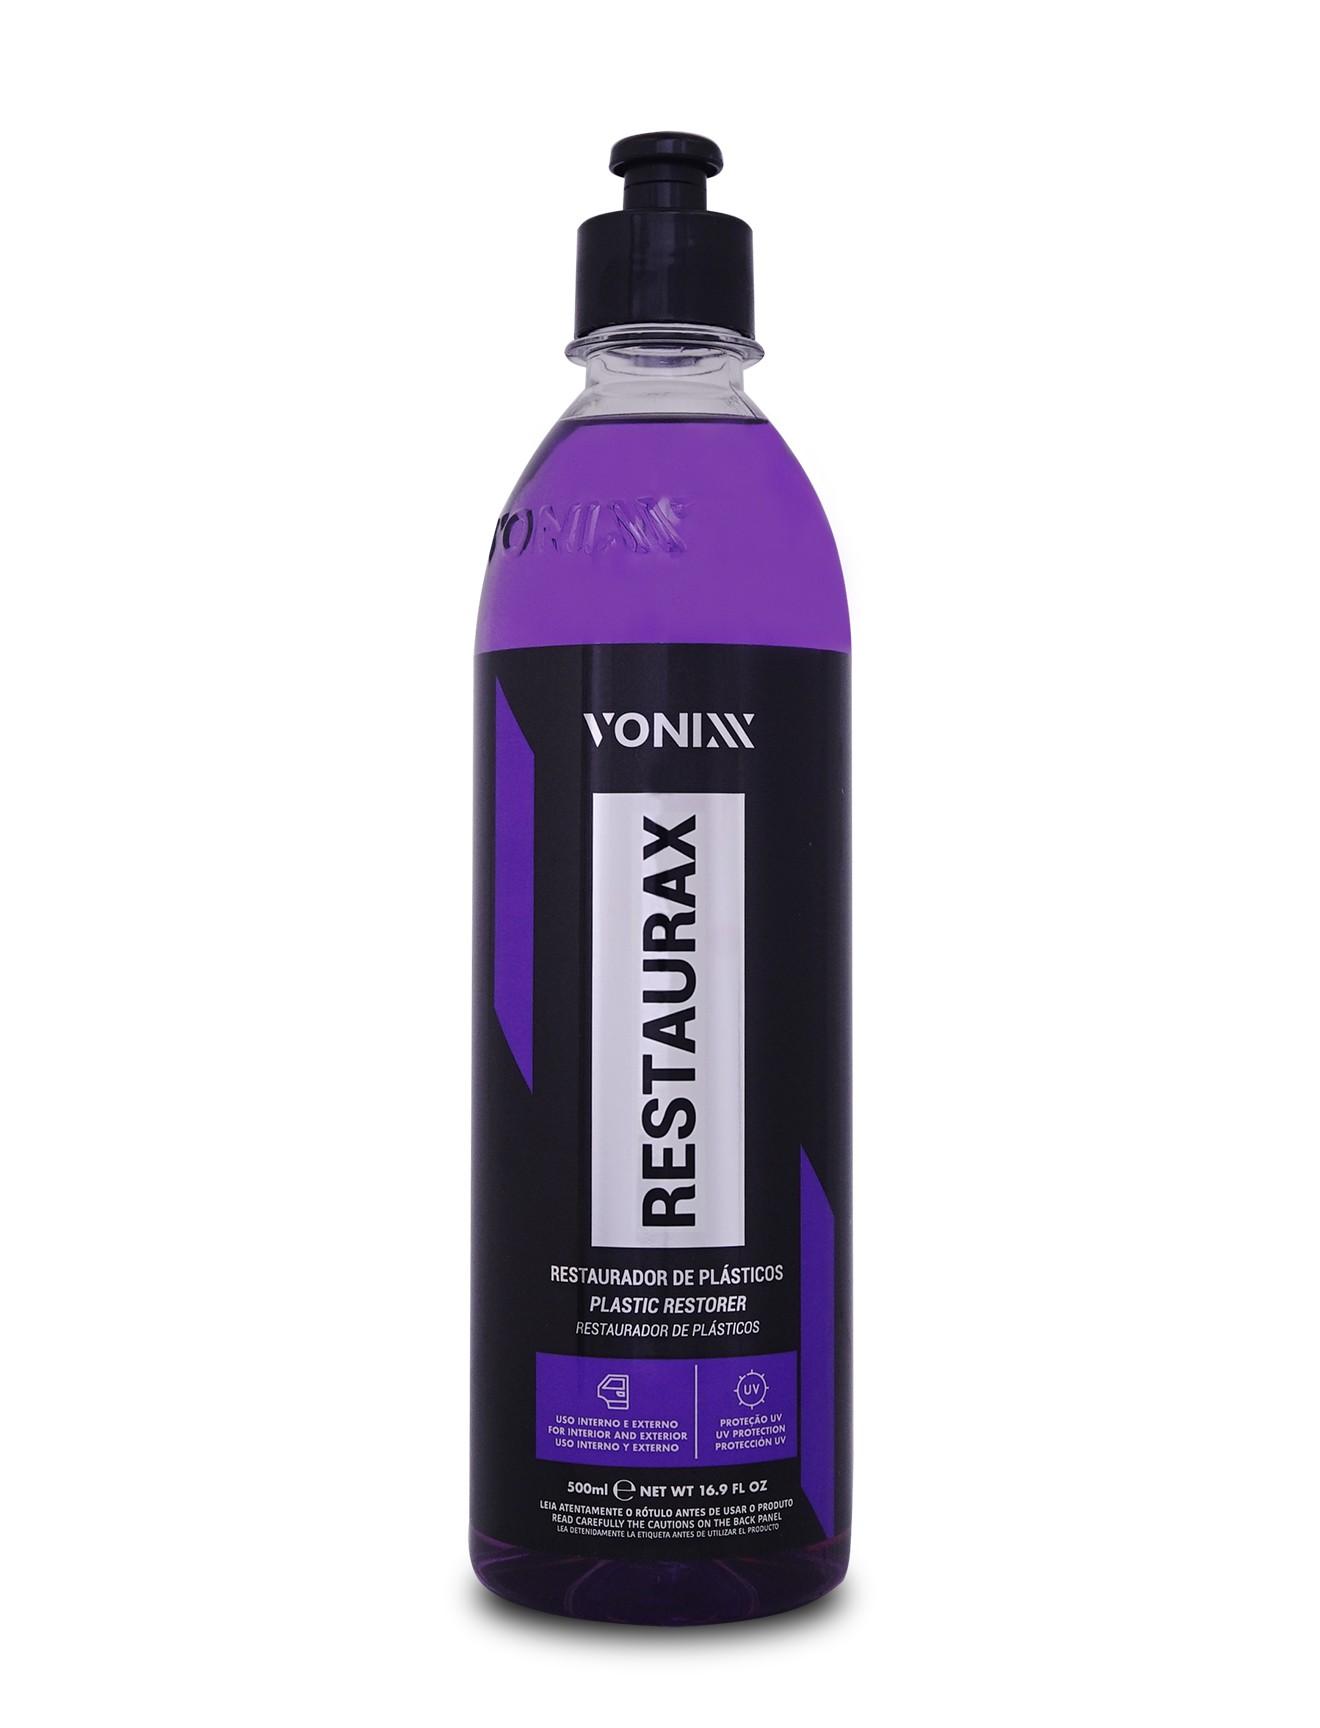 Vonixx Renovador de plásticos Restaurax 500ml